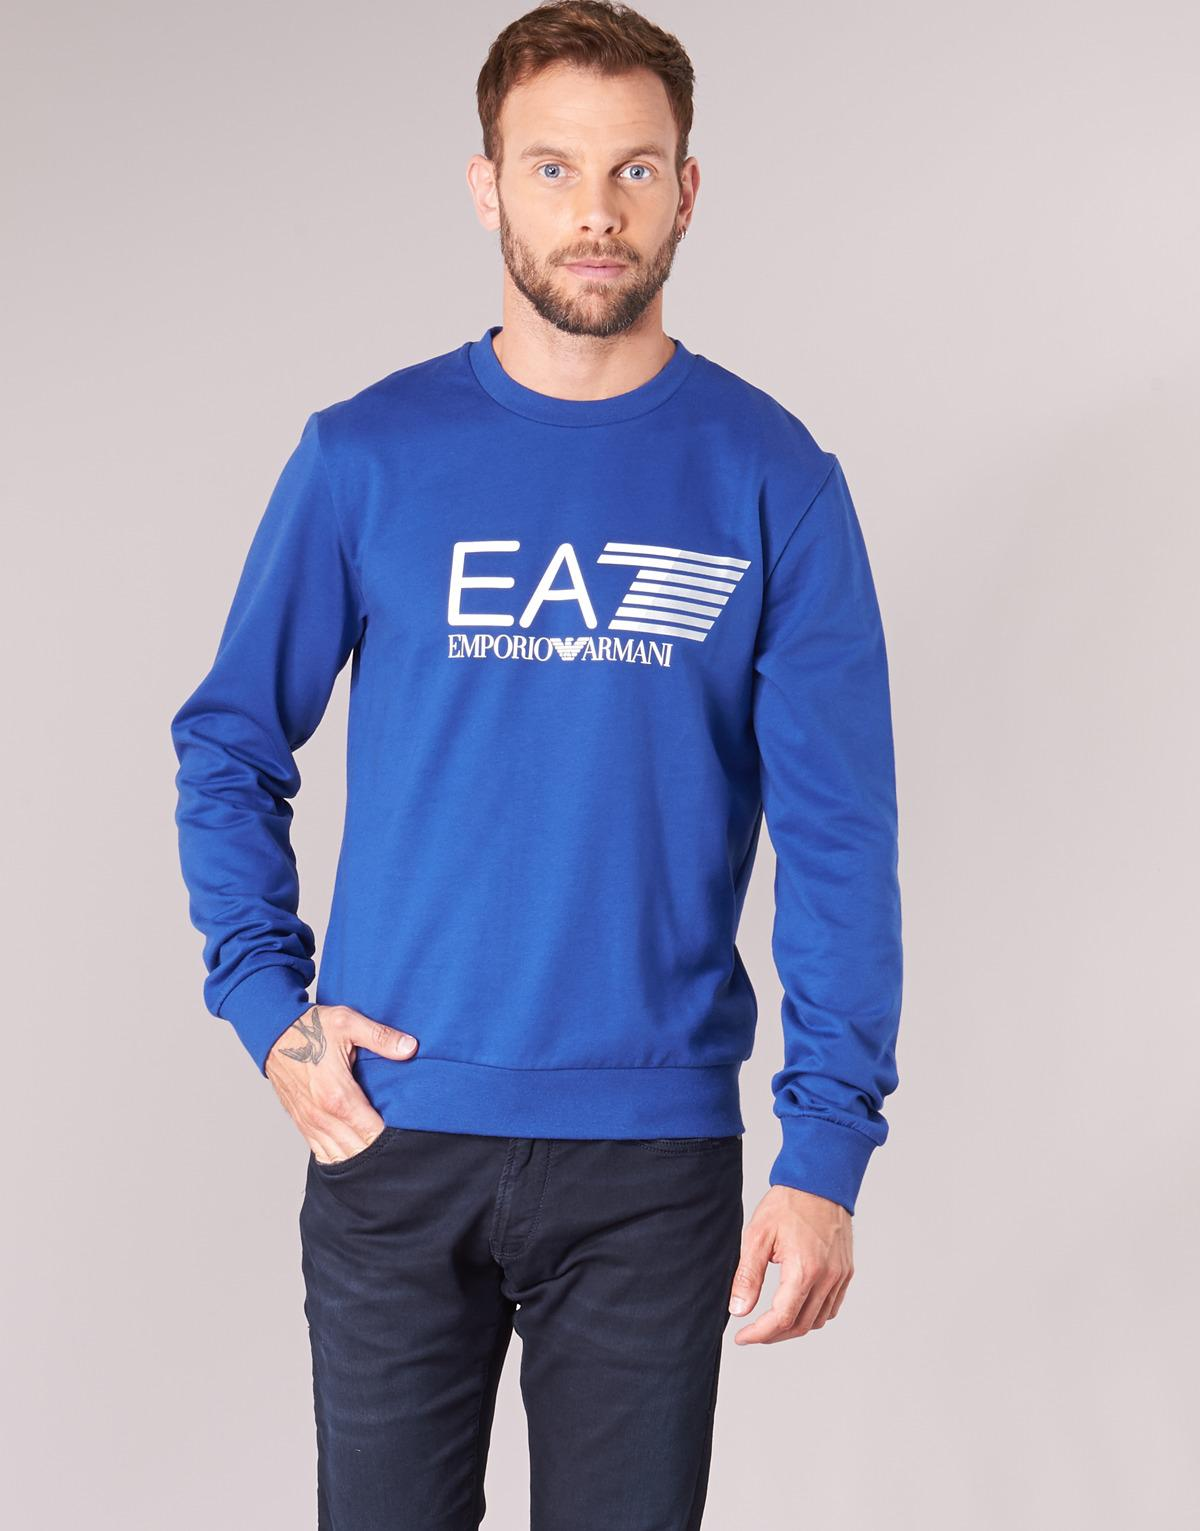 EA7 Train Visibility 3zpm60 Men's Sweatshirt In Blue for Men